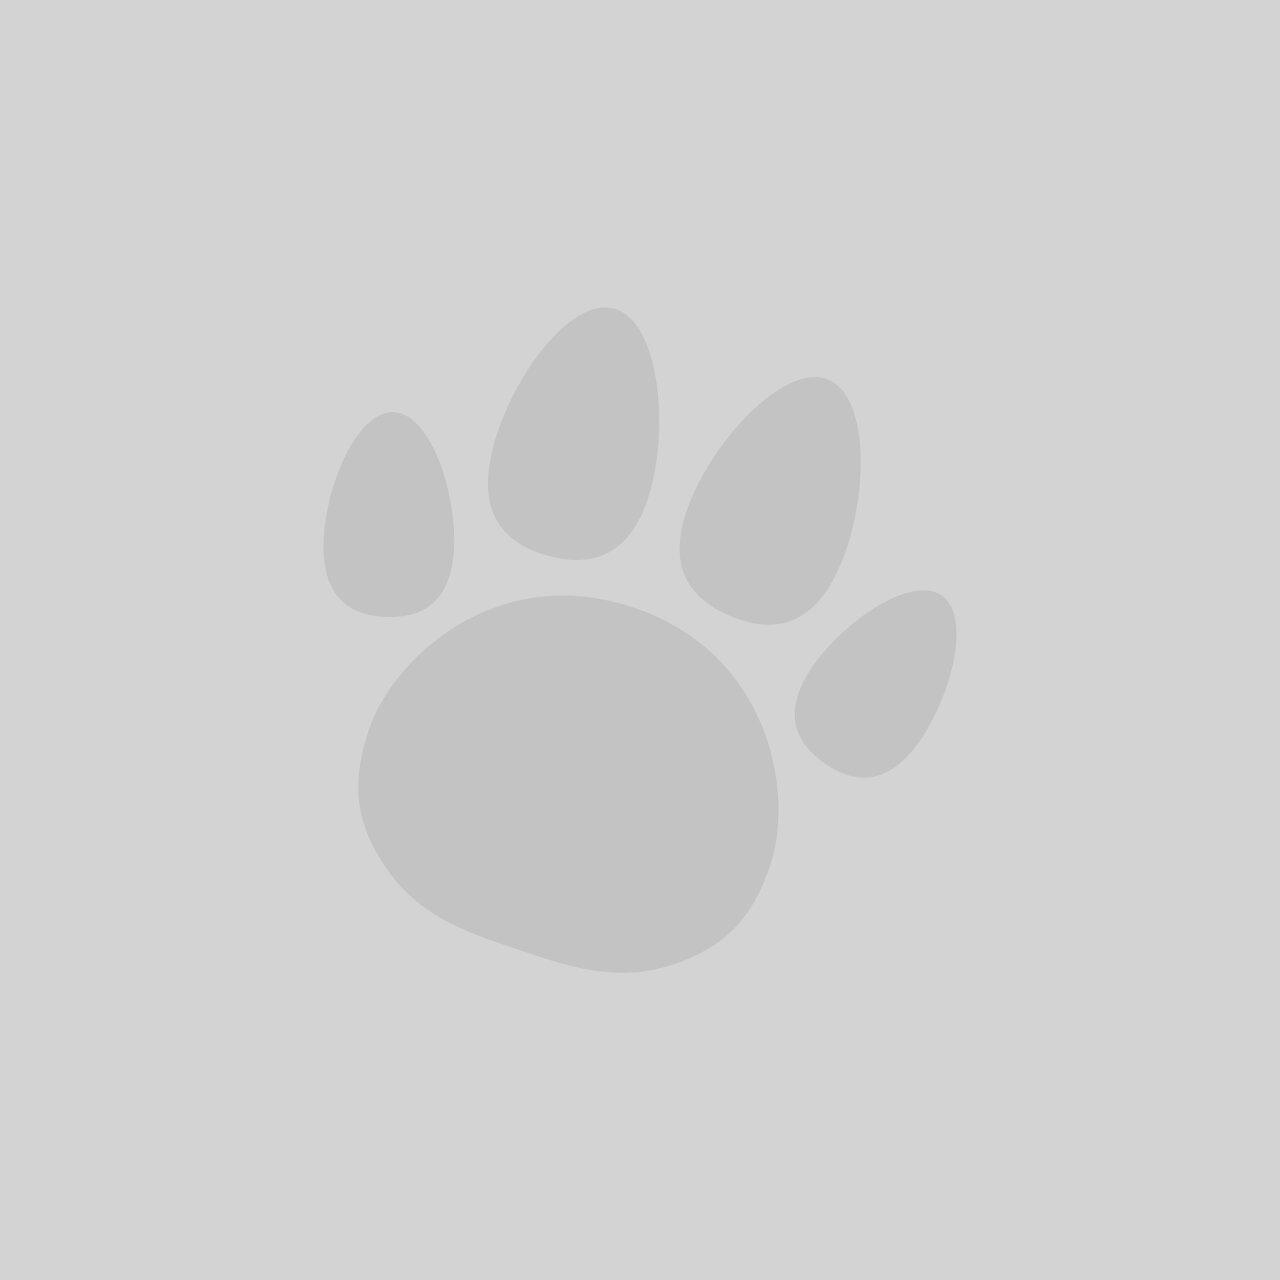 Komodo Dandelion Tortoise Diet 340g